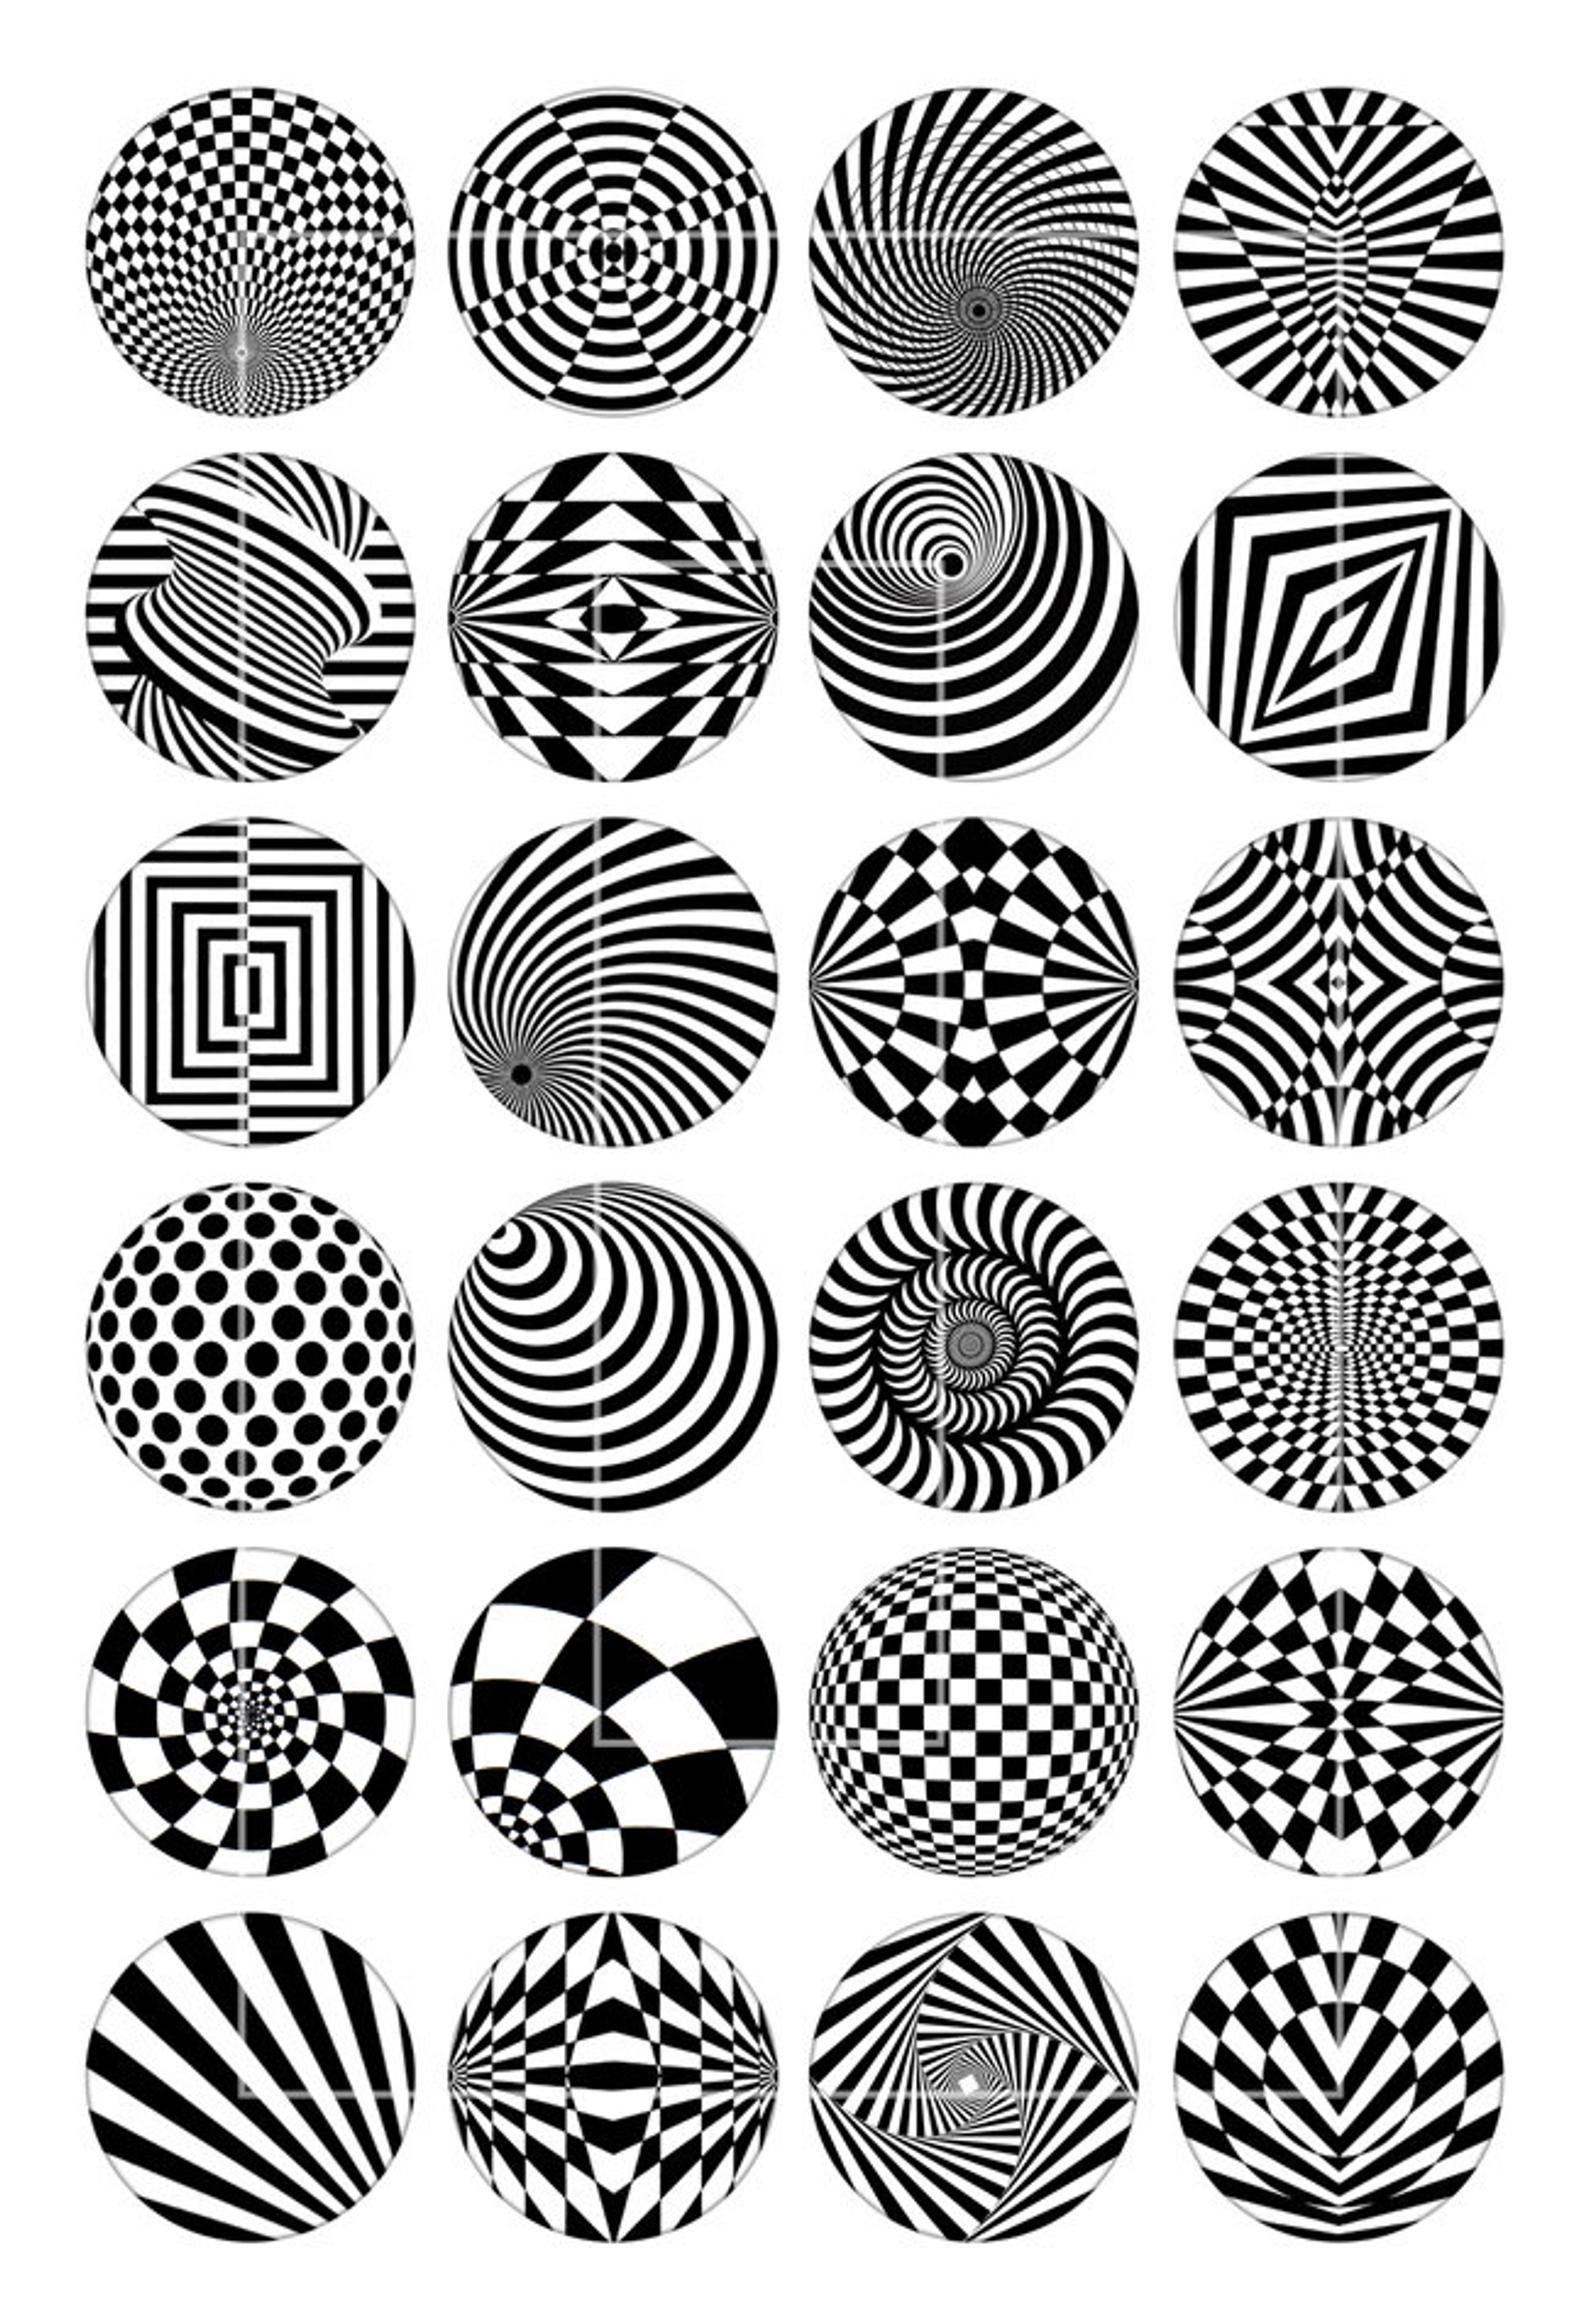 Op art 10mm 12mm 14mm 16mm 18mm Optical Illusion Pop Art Printable images  Digital Collage Sheet - Instant Download